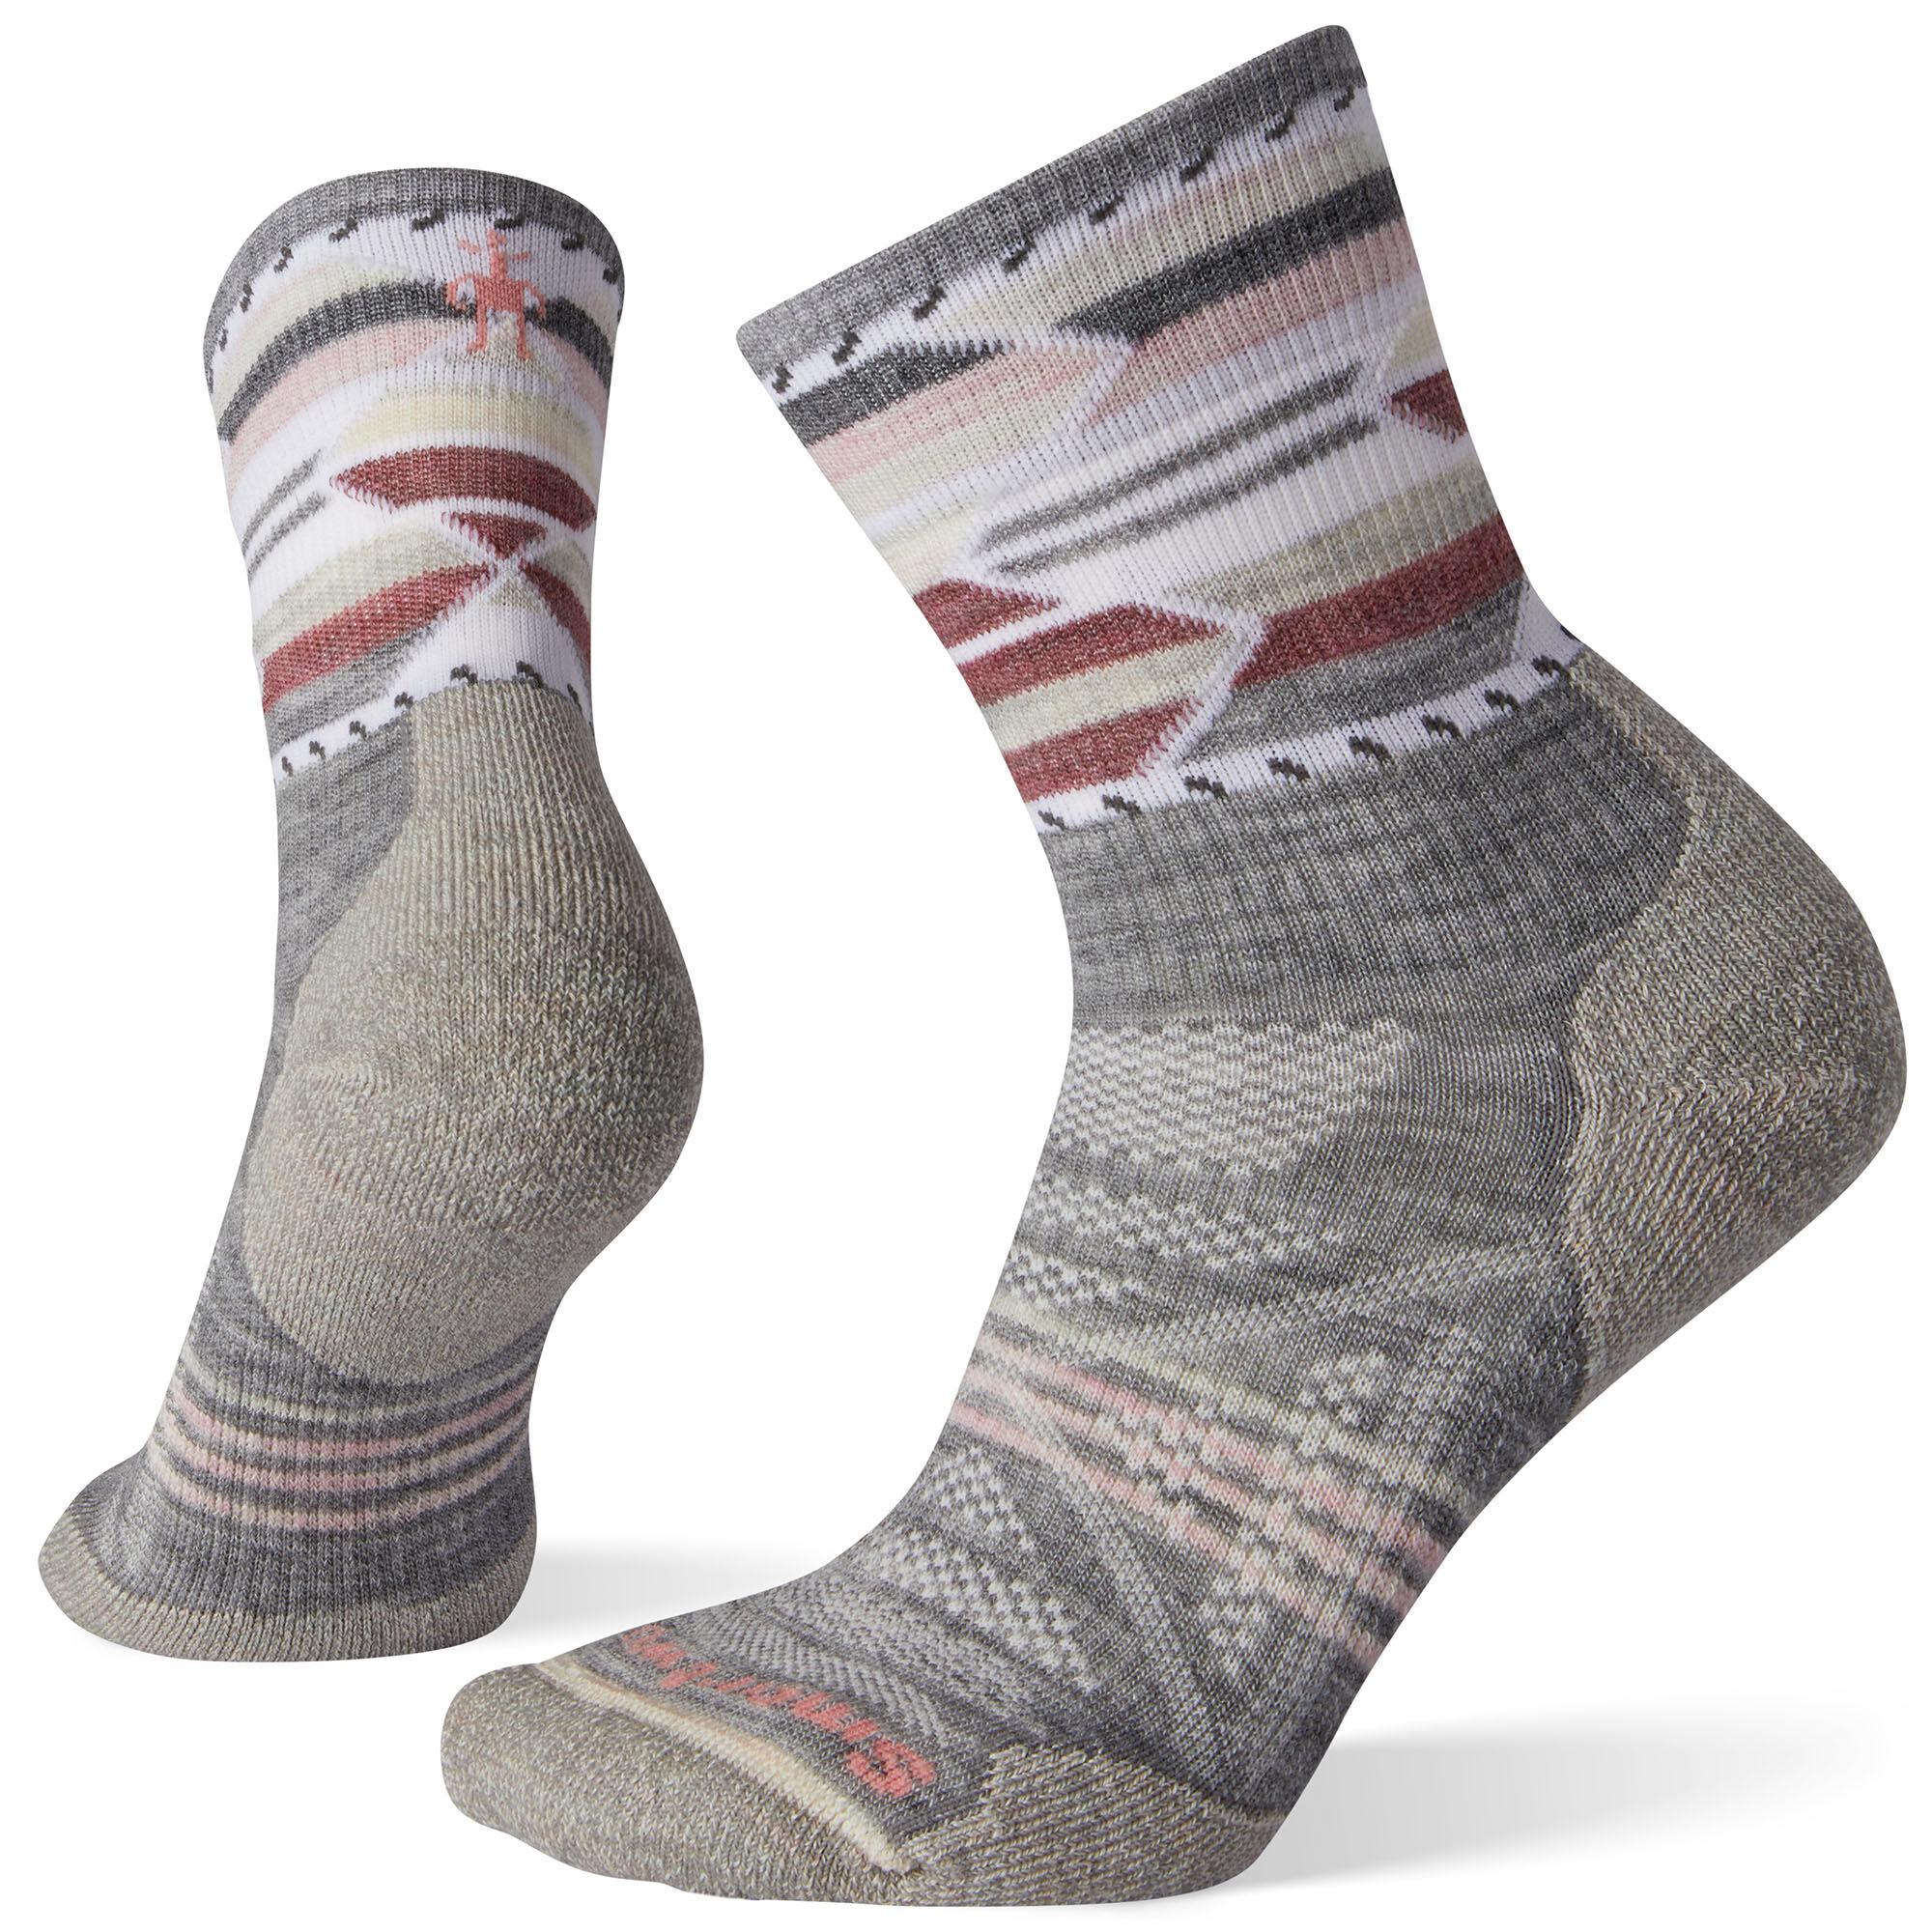 Smartwool Women's PhD Outdoor Light Pattern Mid Crew Hiking Socks  - Light Gray - Size: Large